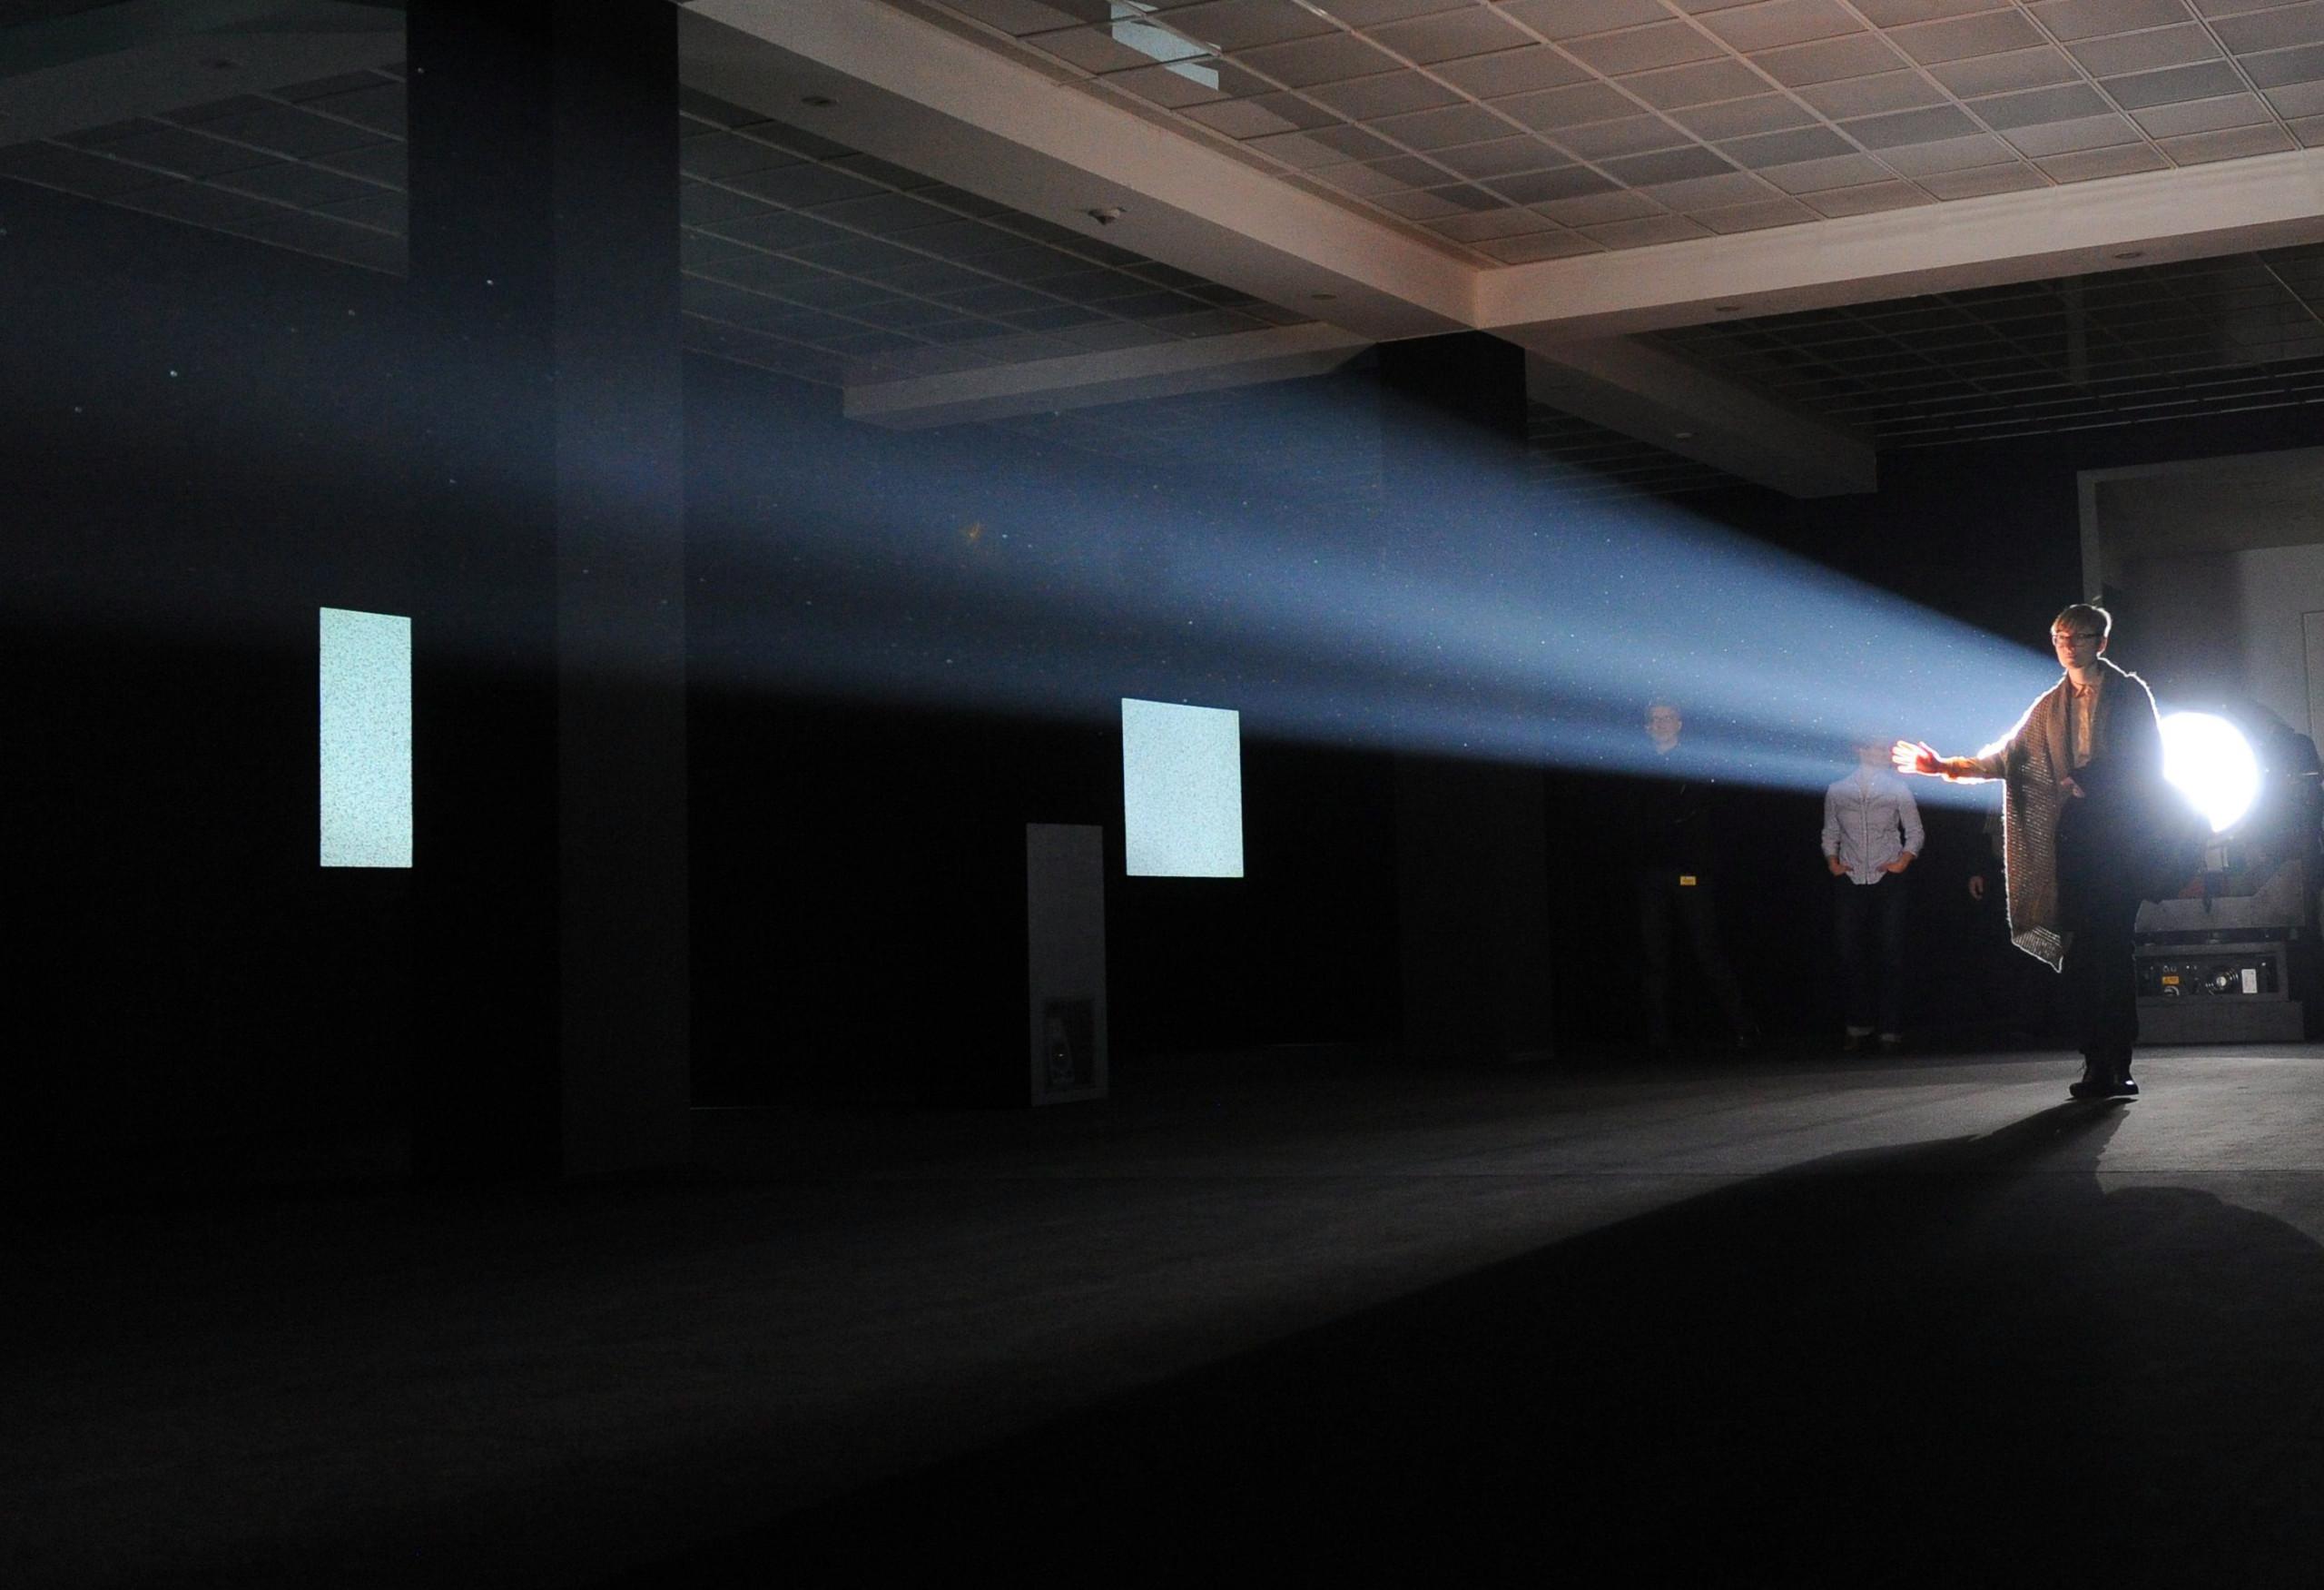 Conferência e ciclo de cinema 'revisitam' legado de Ingmar Bergman